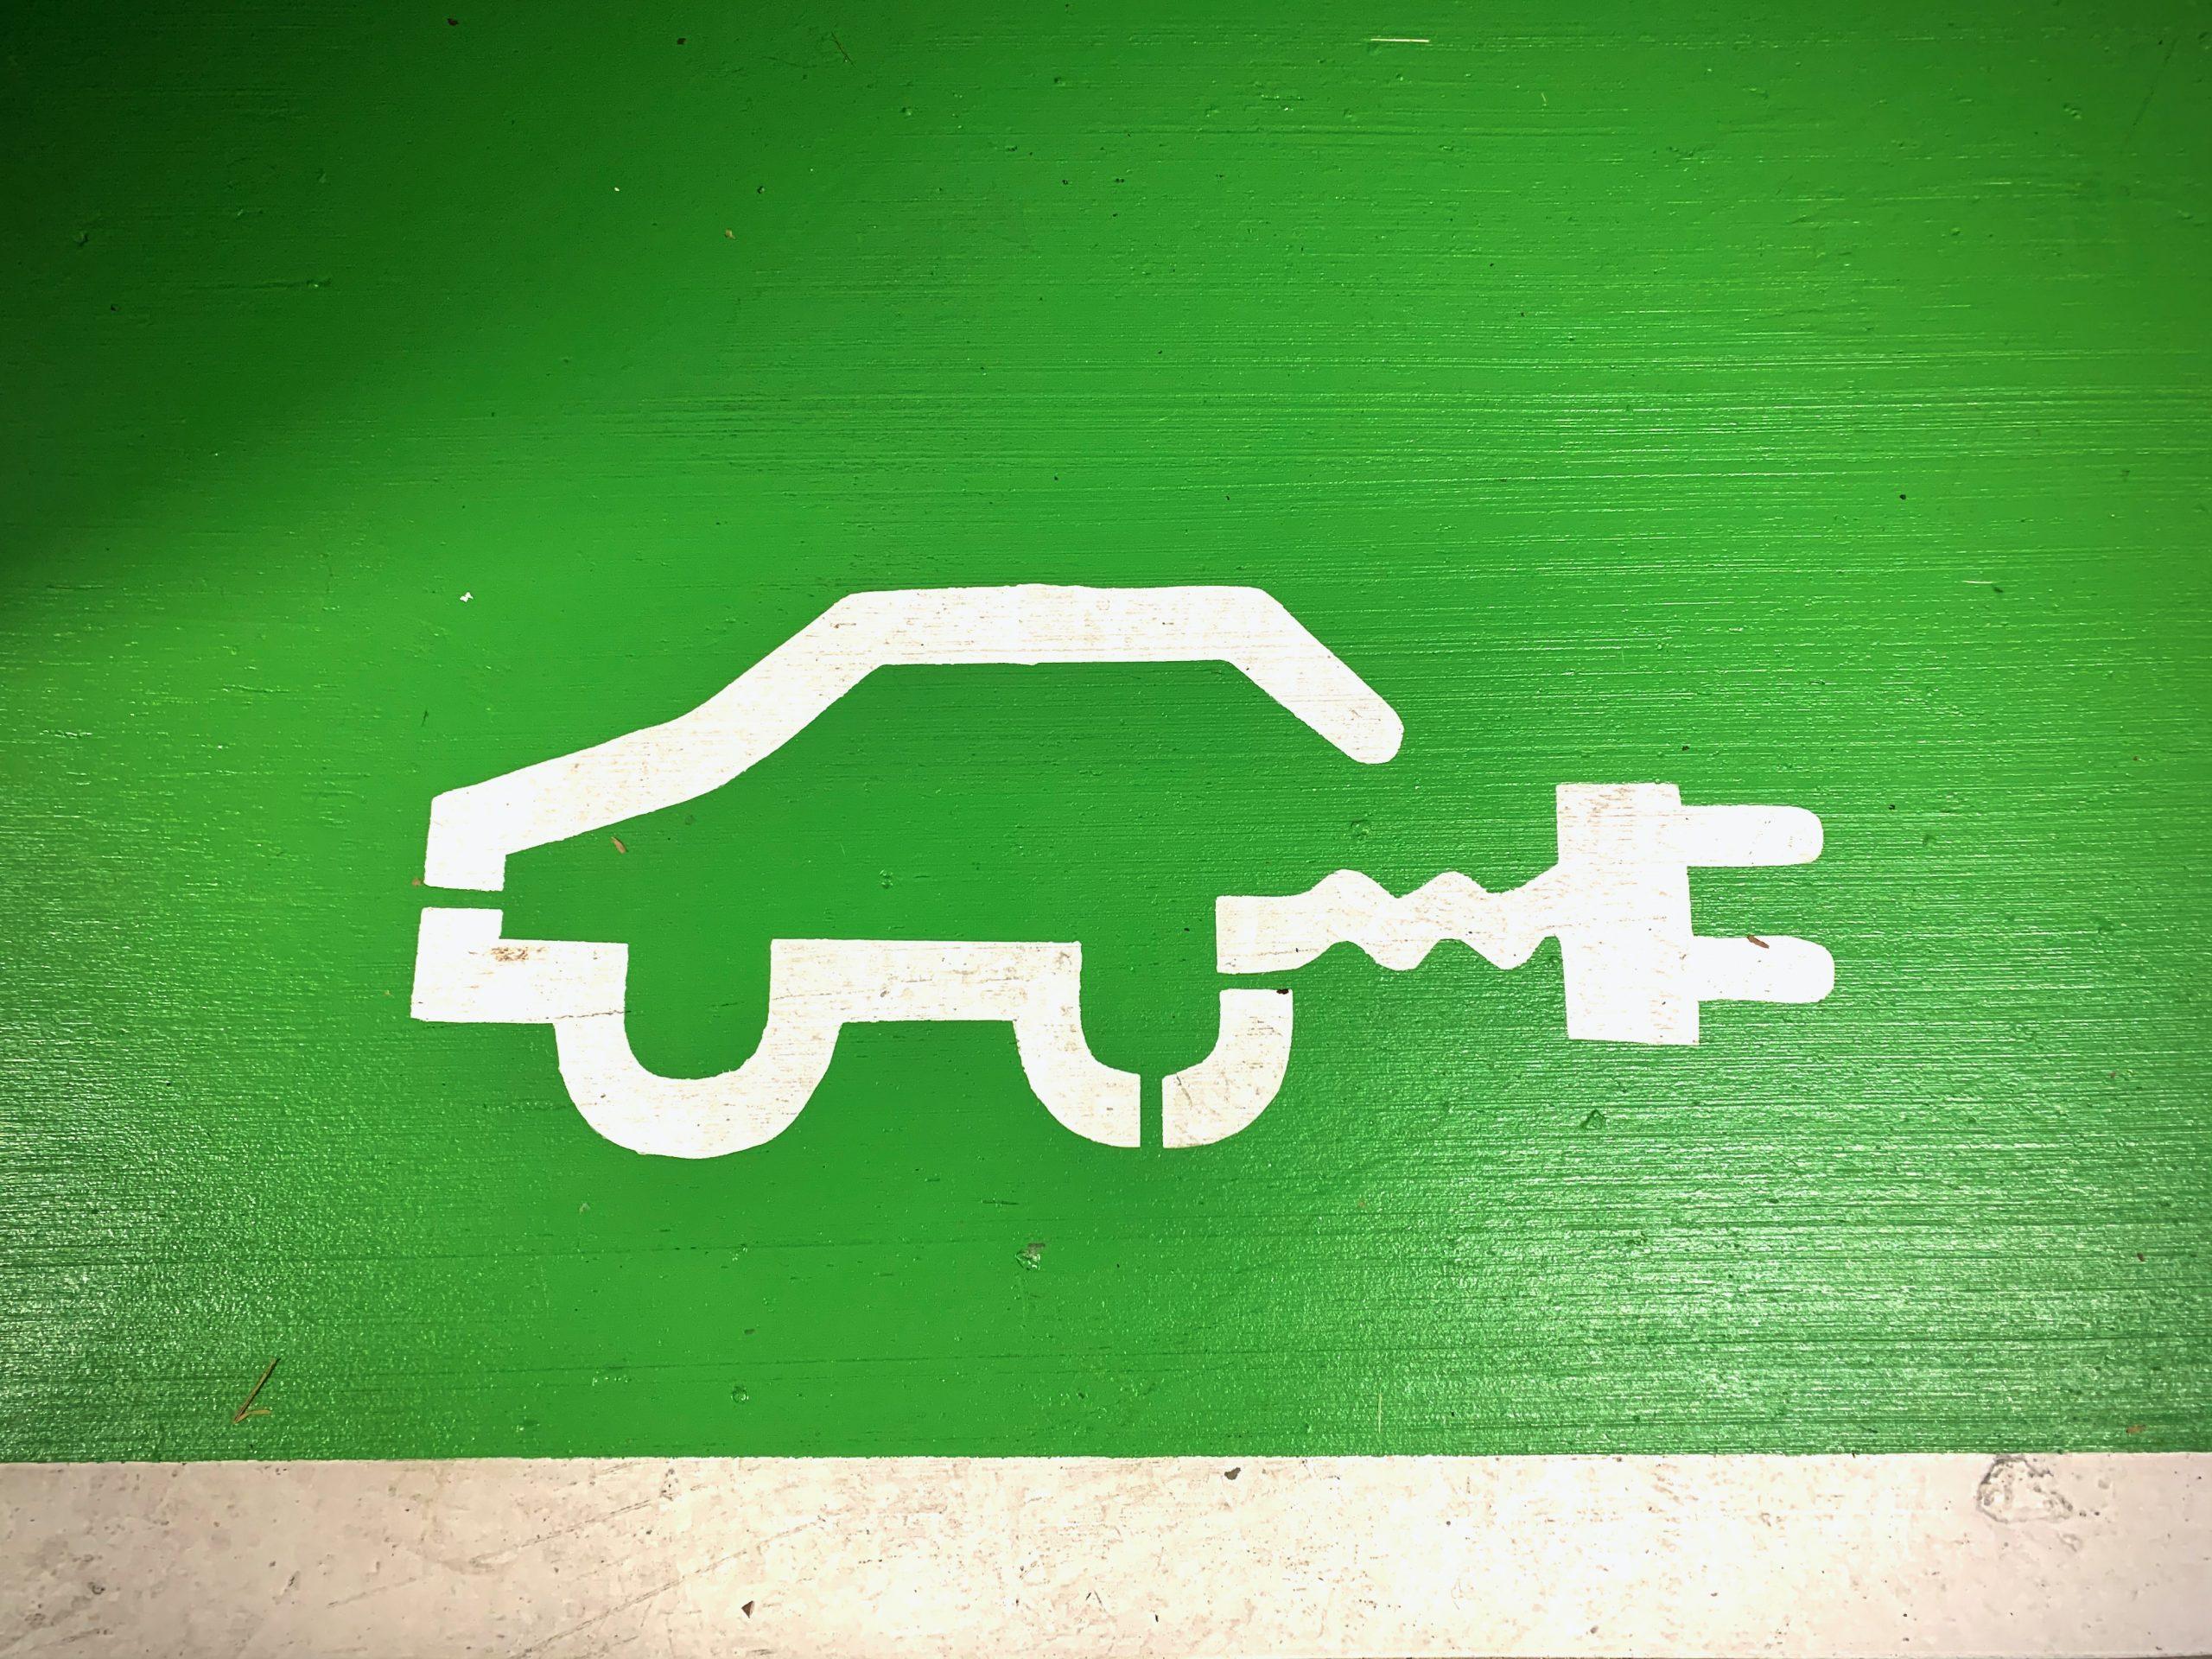 Hydrogen-cell-green-initiative-internet-bull-report